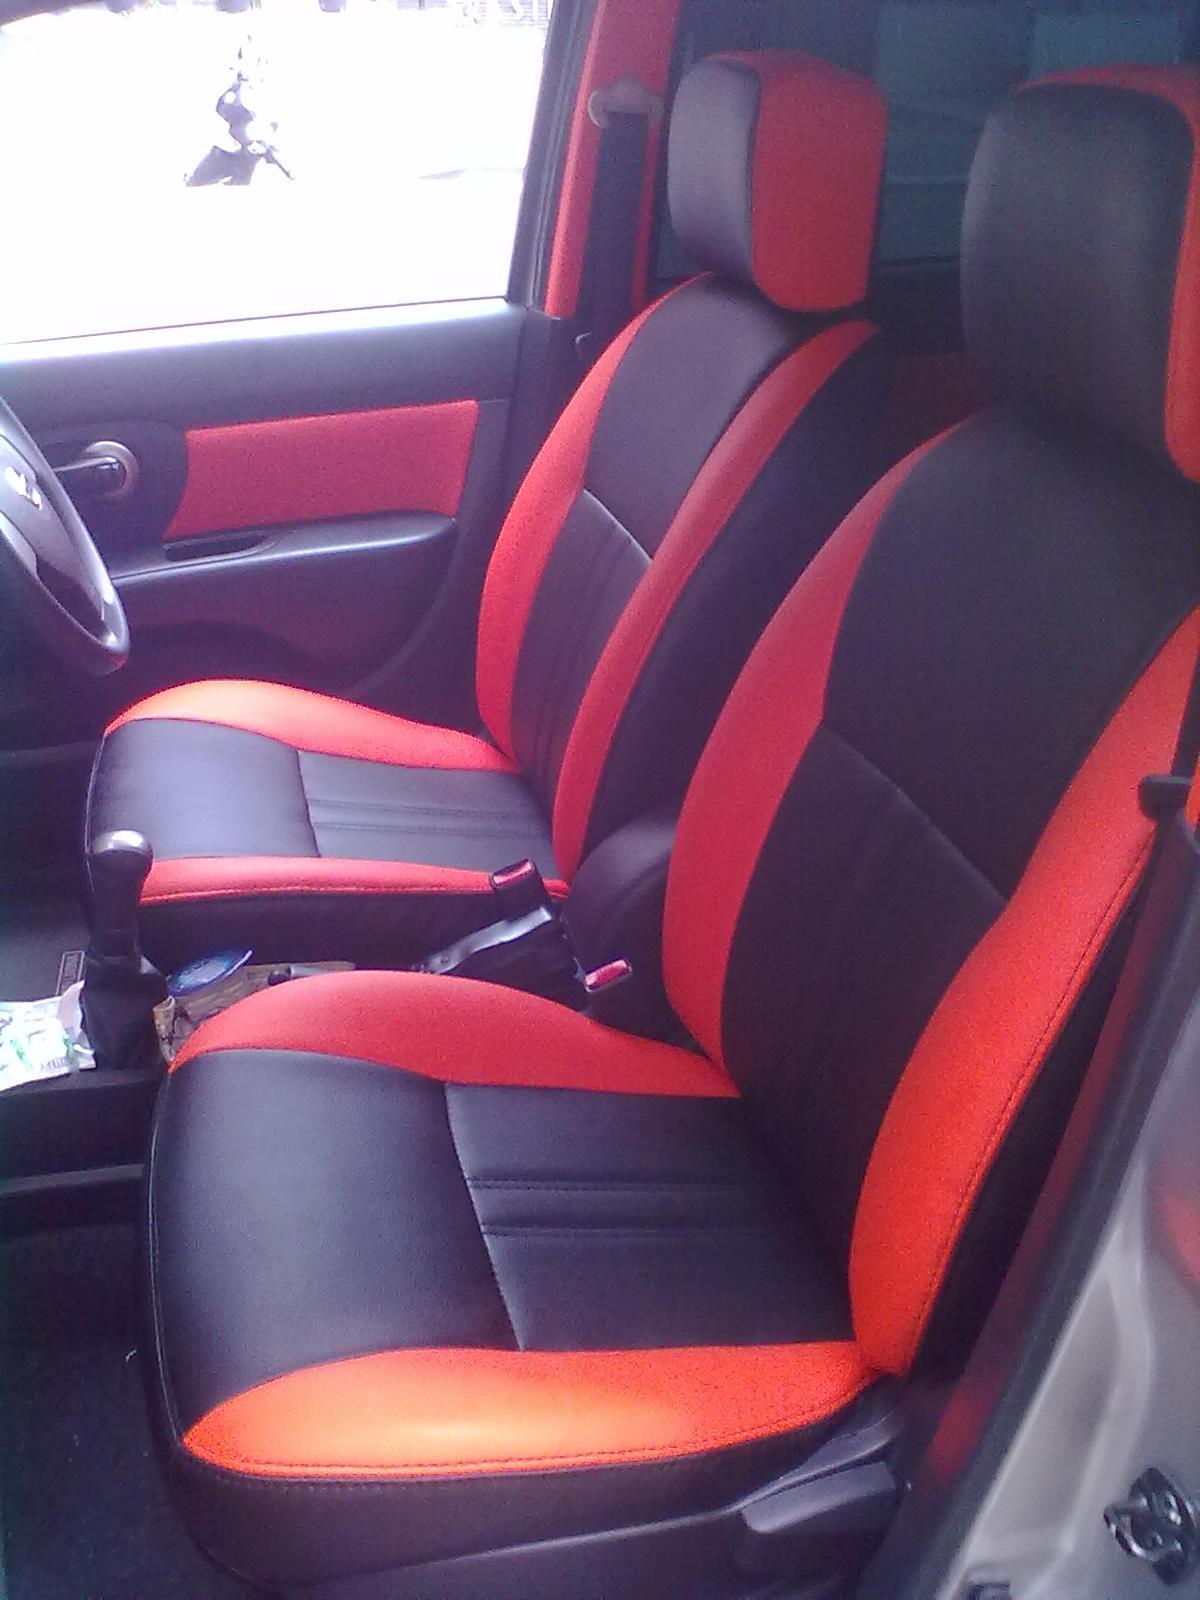 Jok Grand New Avanza Type E 2016 97 Biaya Modifikasi Mobil 2018